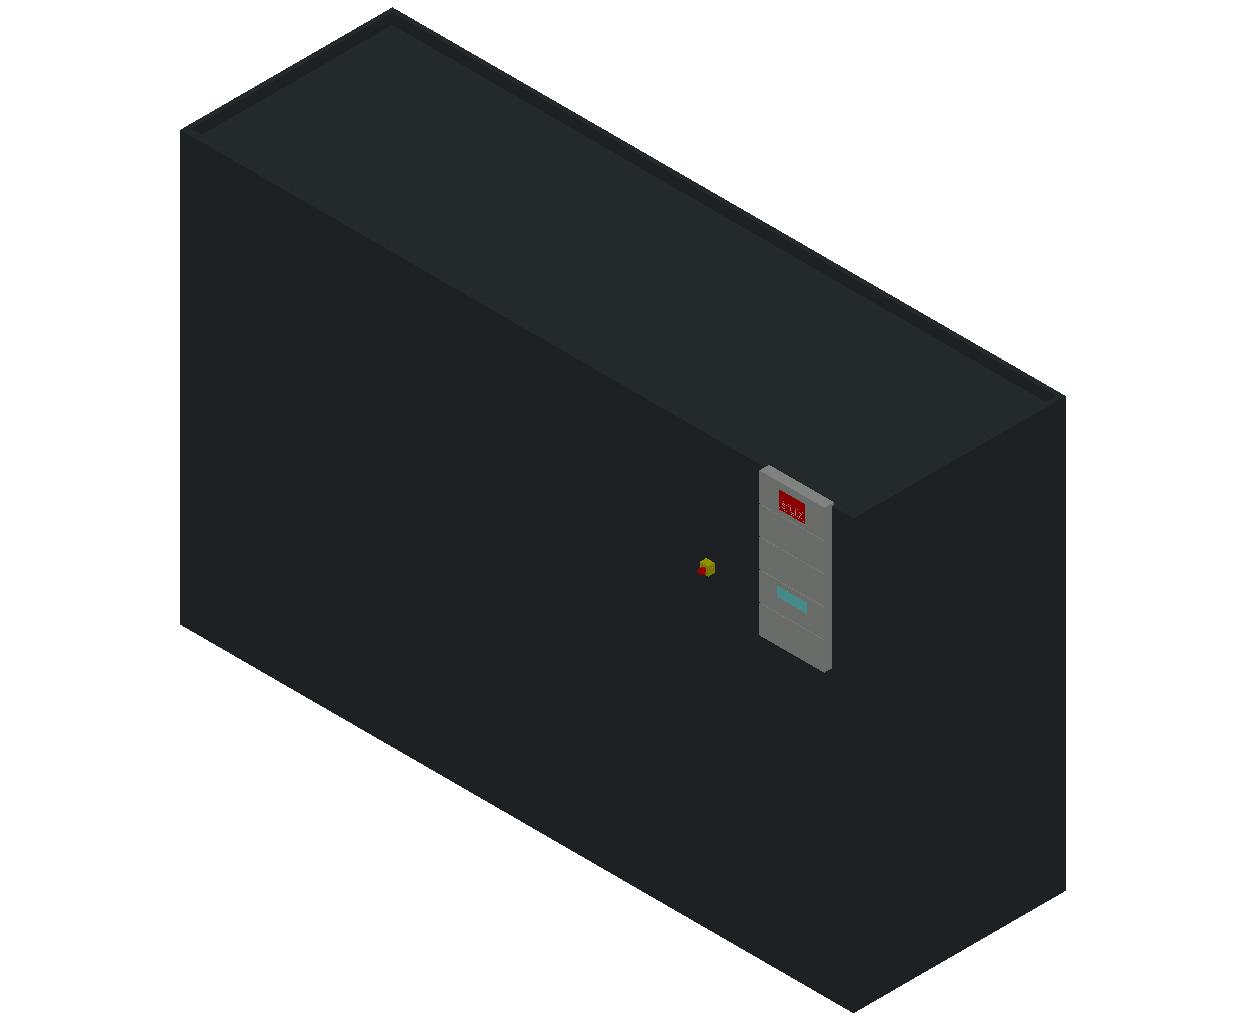 HC_Air Conditioner_Indoor Unit_MEPcontent_STULZ_CyberAir 3PRO_ALD_Dual Circuit GE_ALD_902_GE_INT-EN.dwg